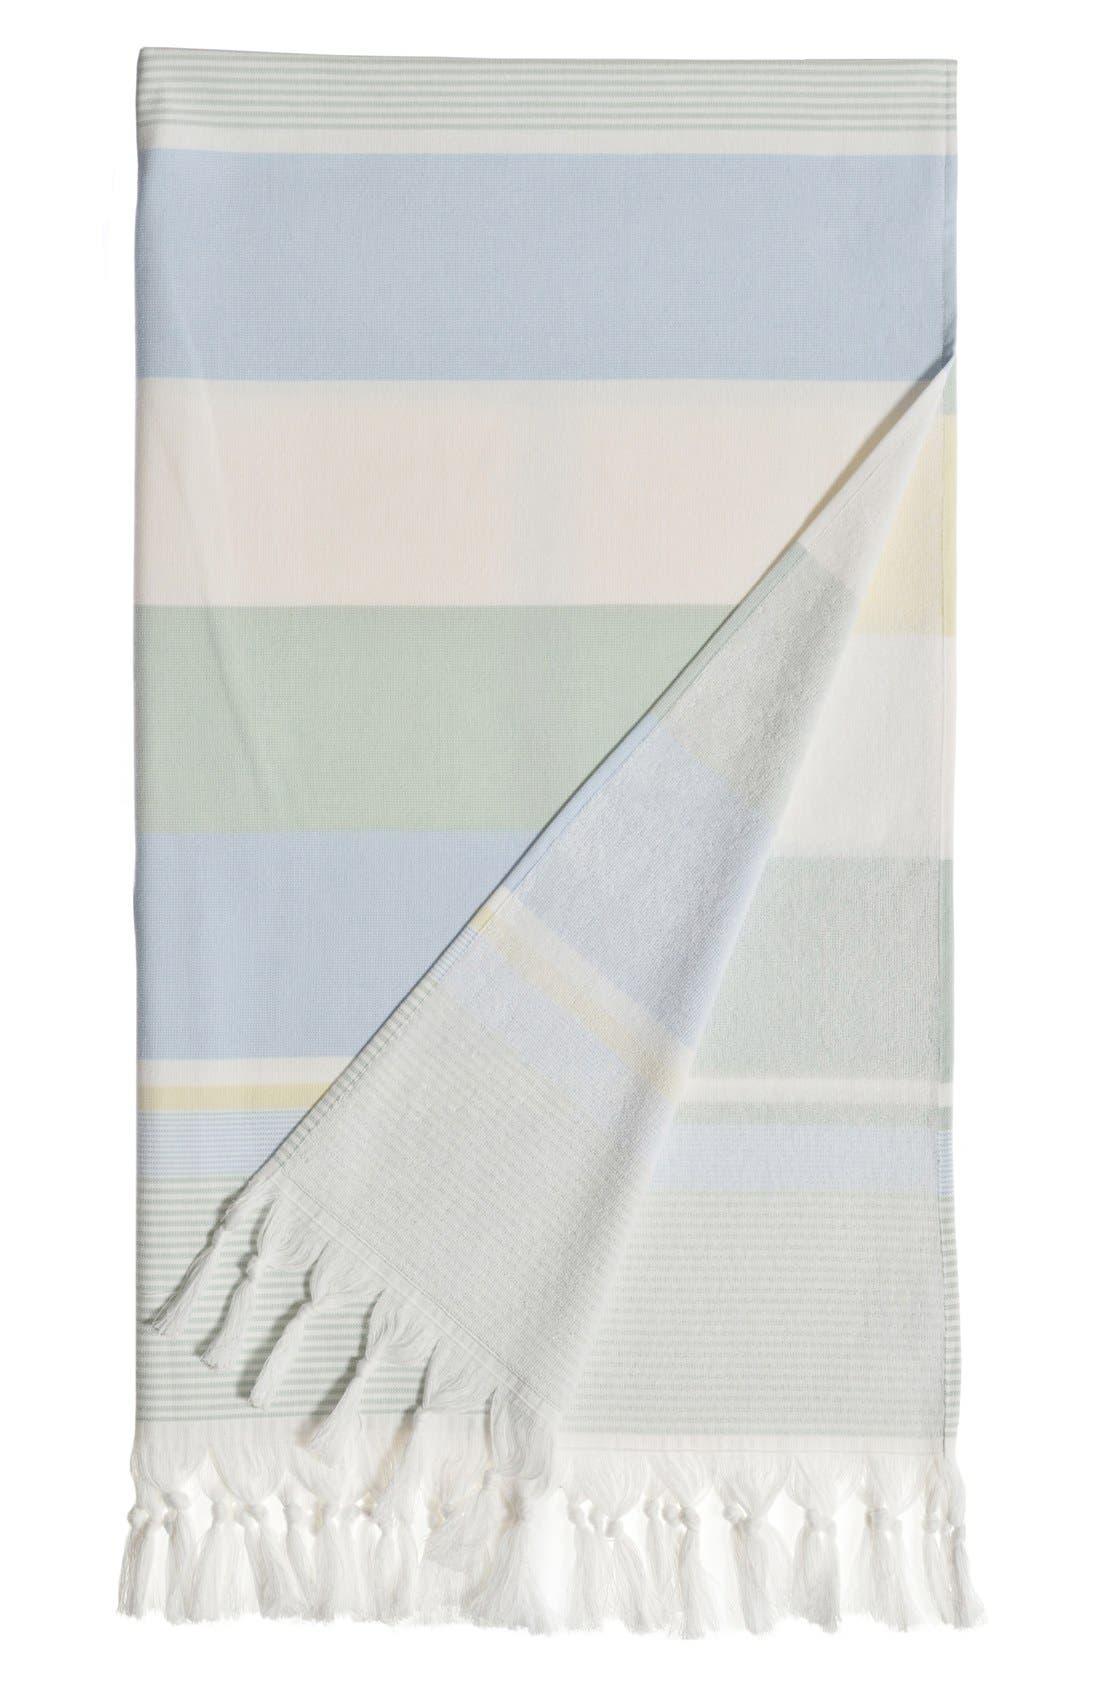 'Summer Loving' Turkish Pestemal Towel,                             Main thumbnail 1, color,                             Sky Blue